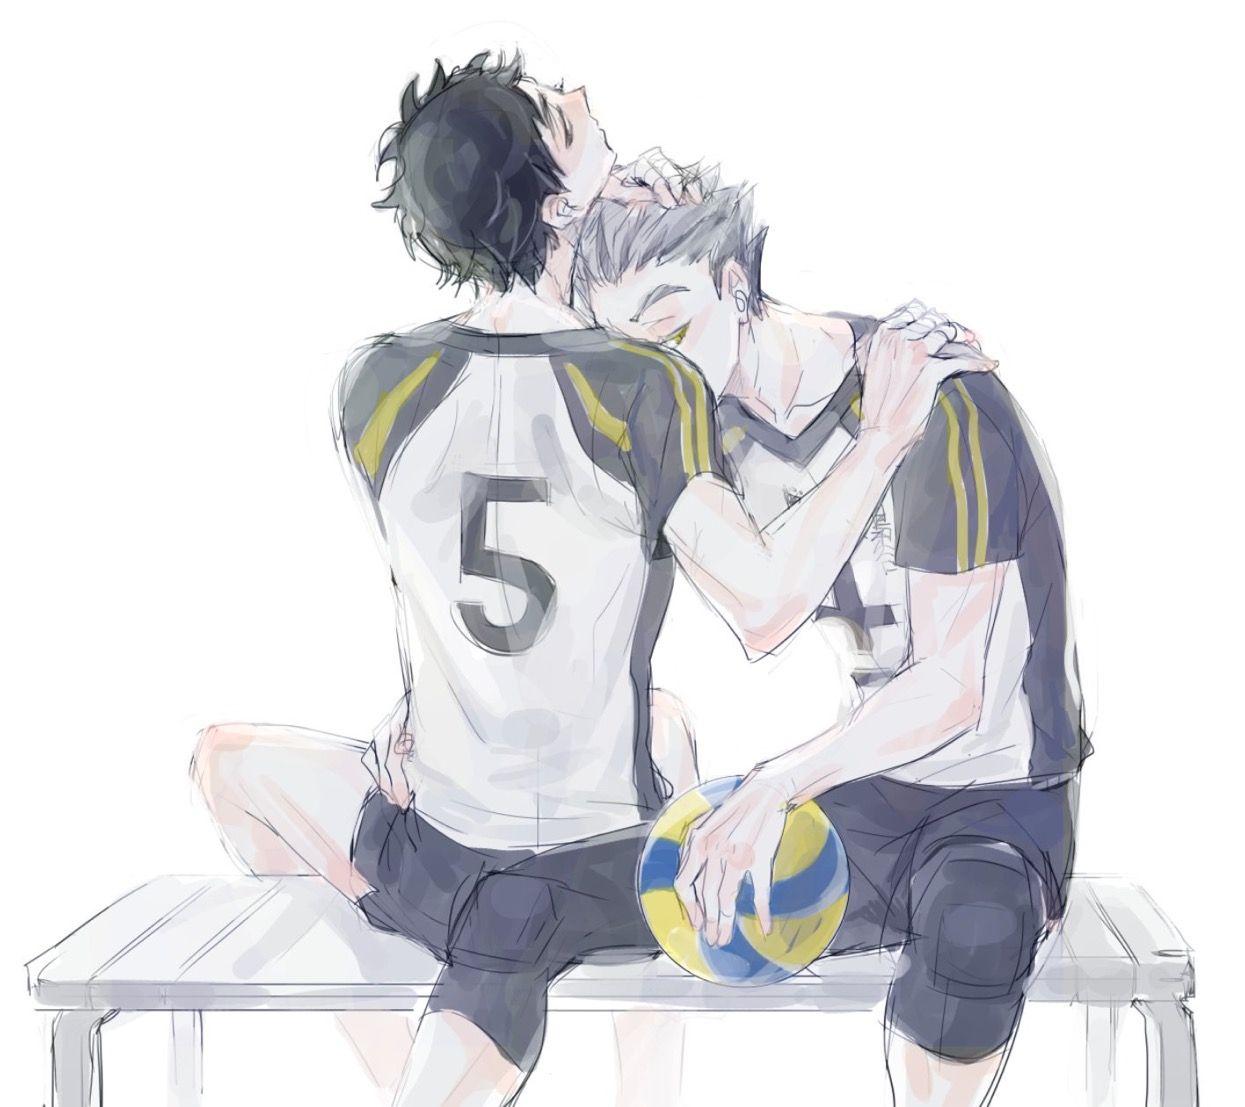 BokuAka Аниме, Волейбол, Япония